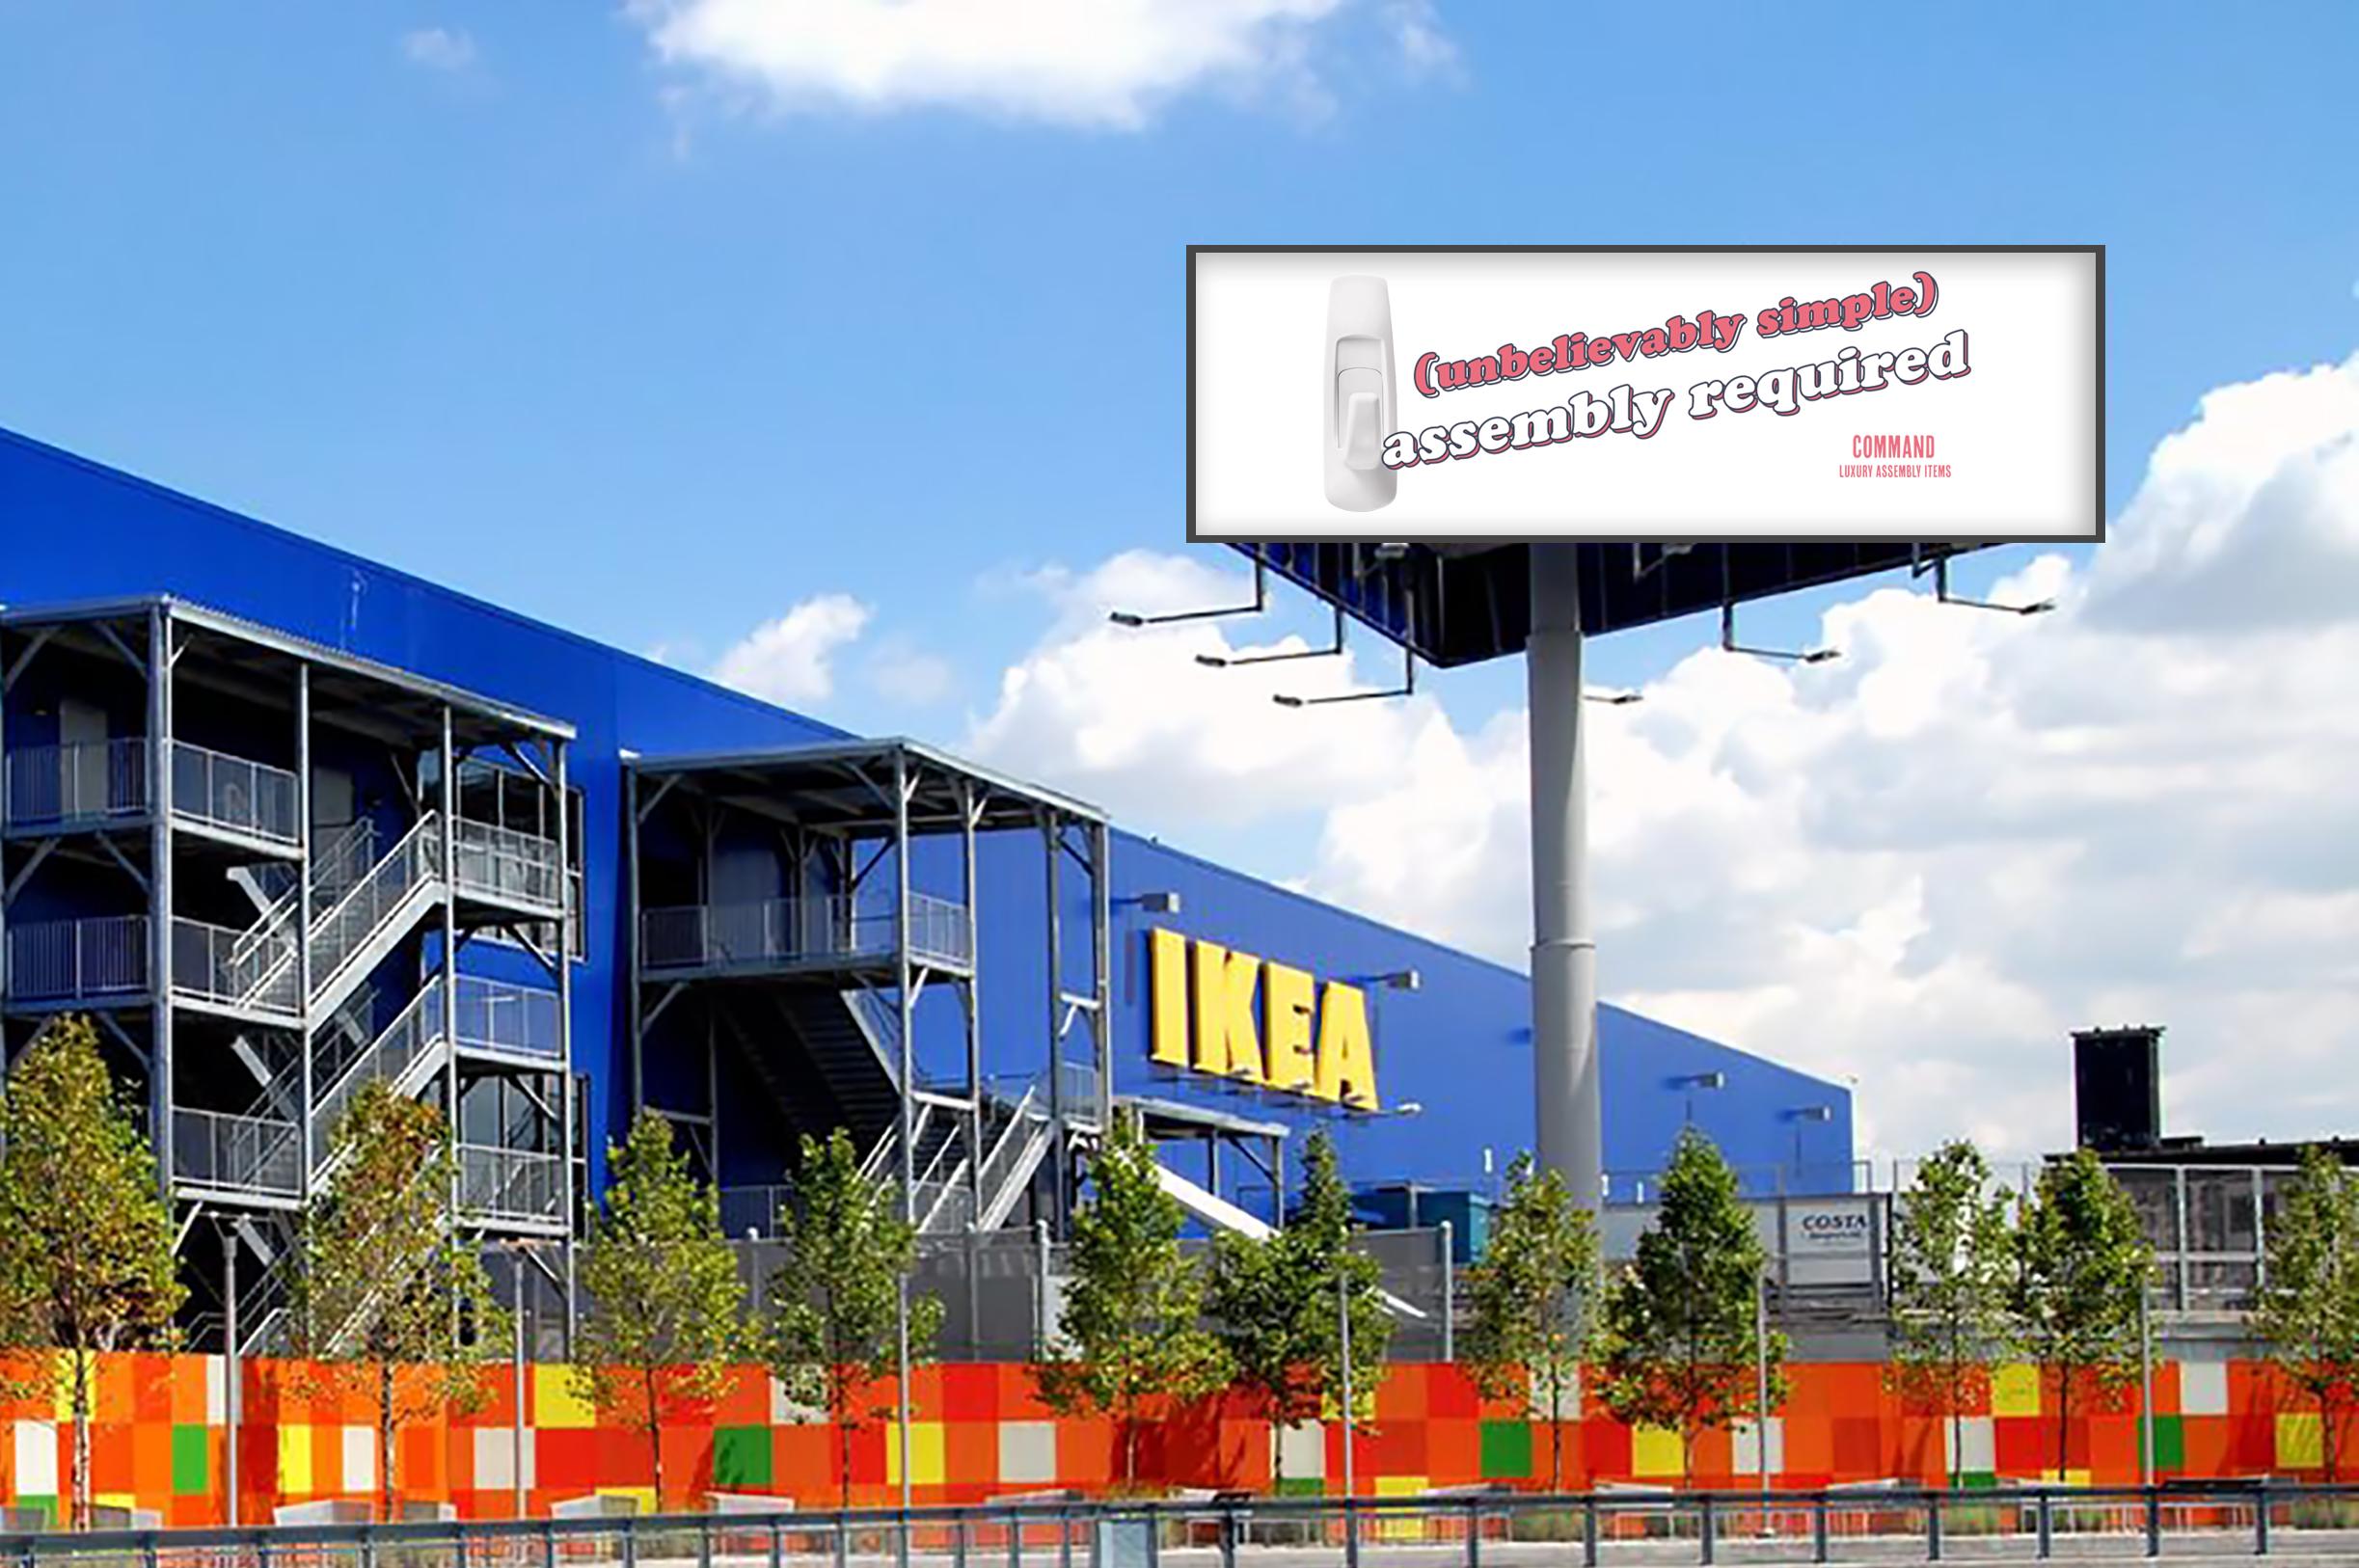 Command-Billboard-Ikea.png